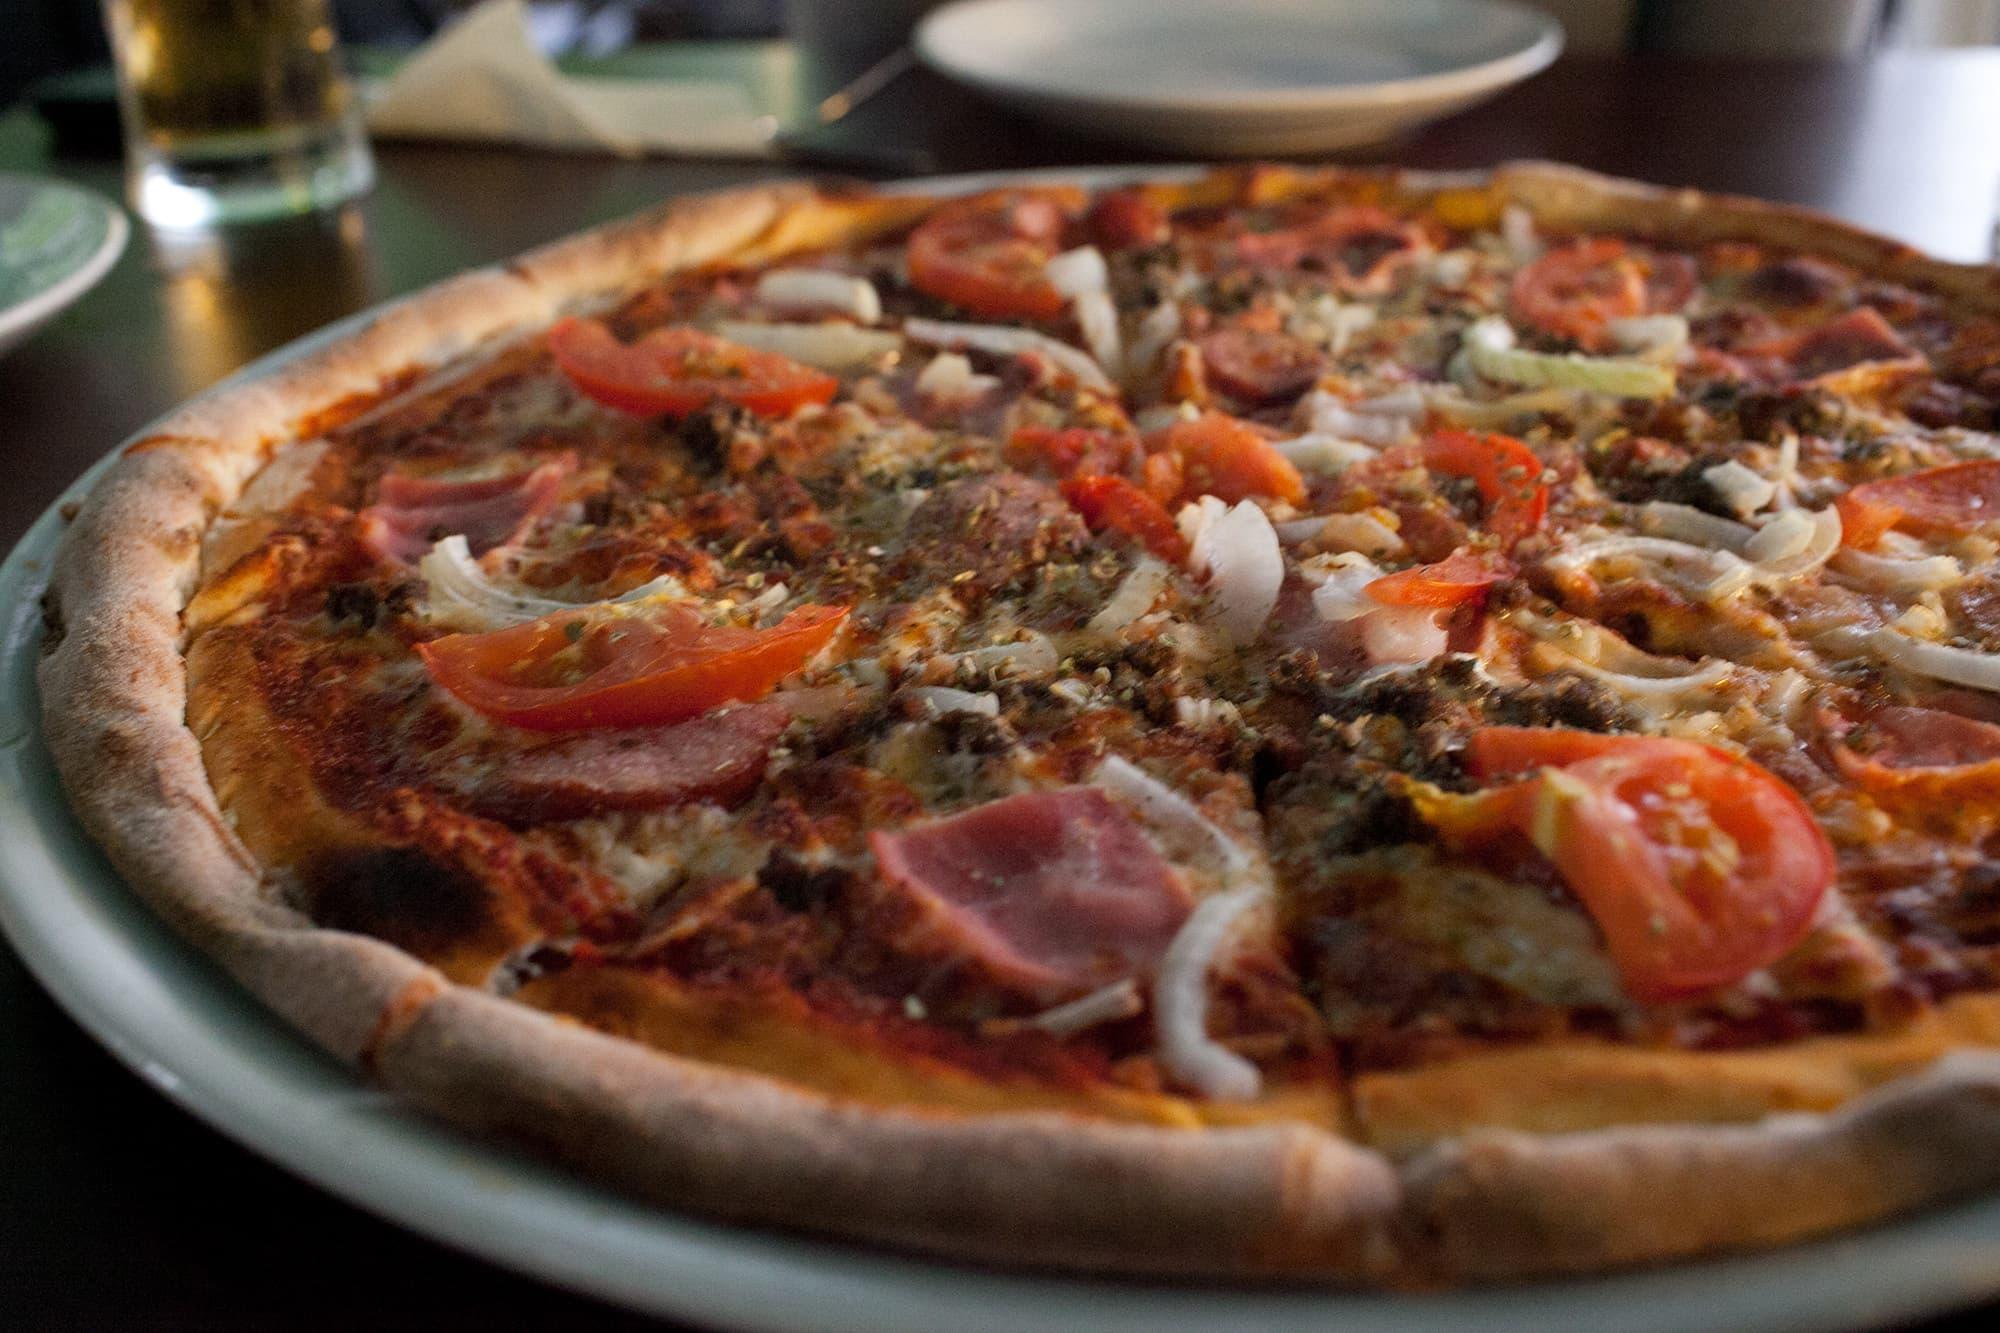 Pizza in Warsaw, Poland.